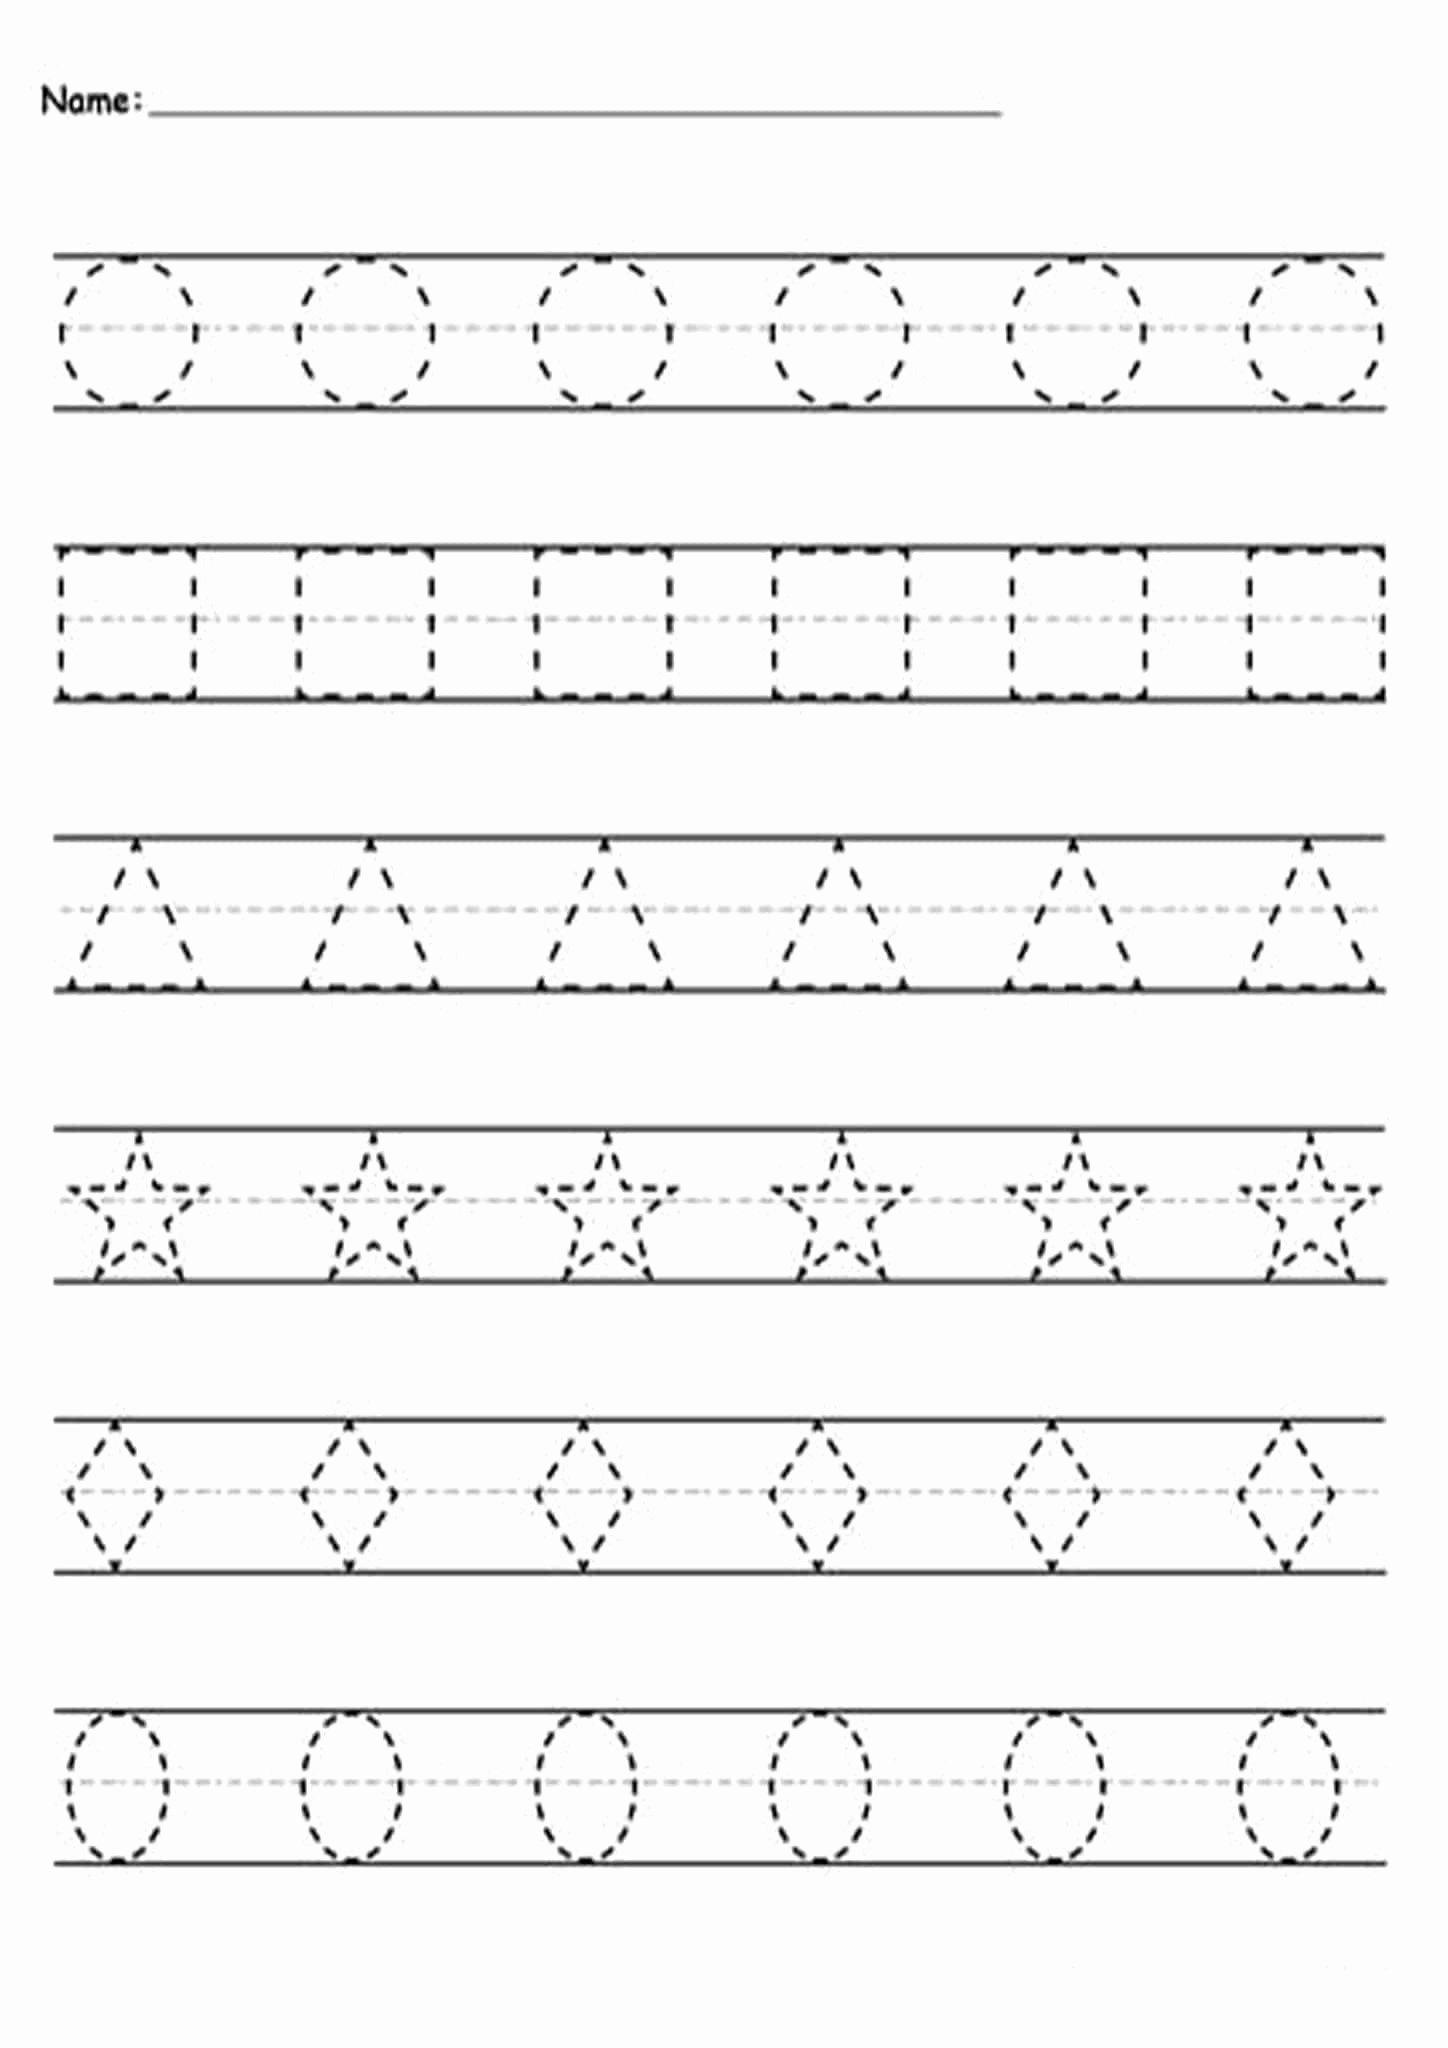 Tracing Lines Worksheets For Preschoolers